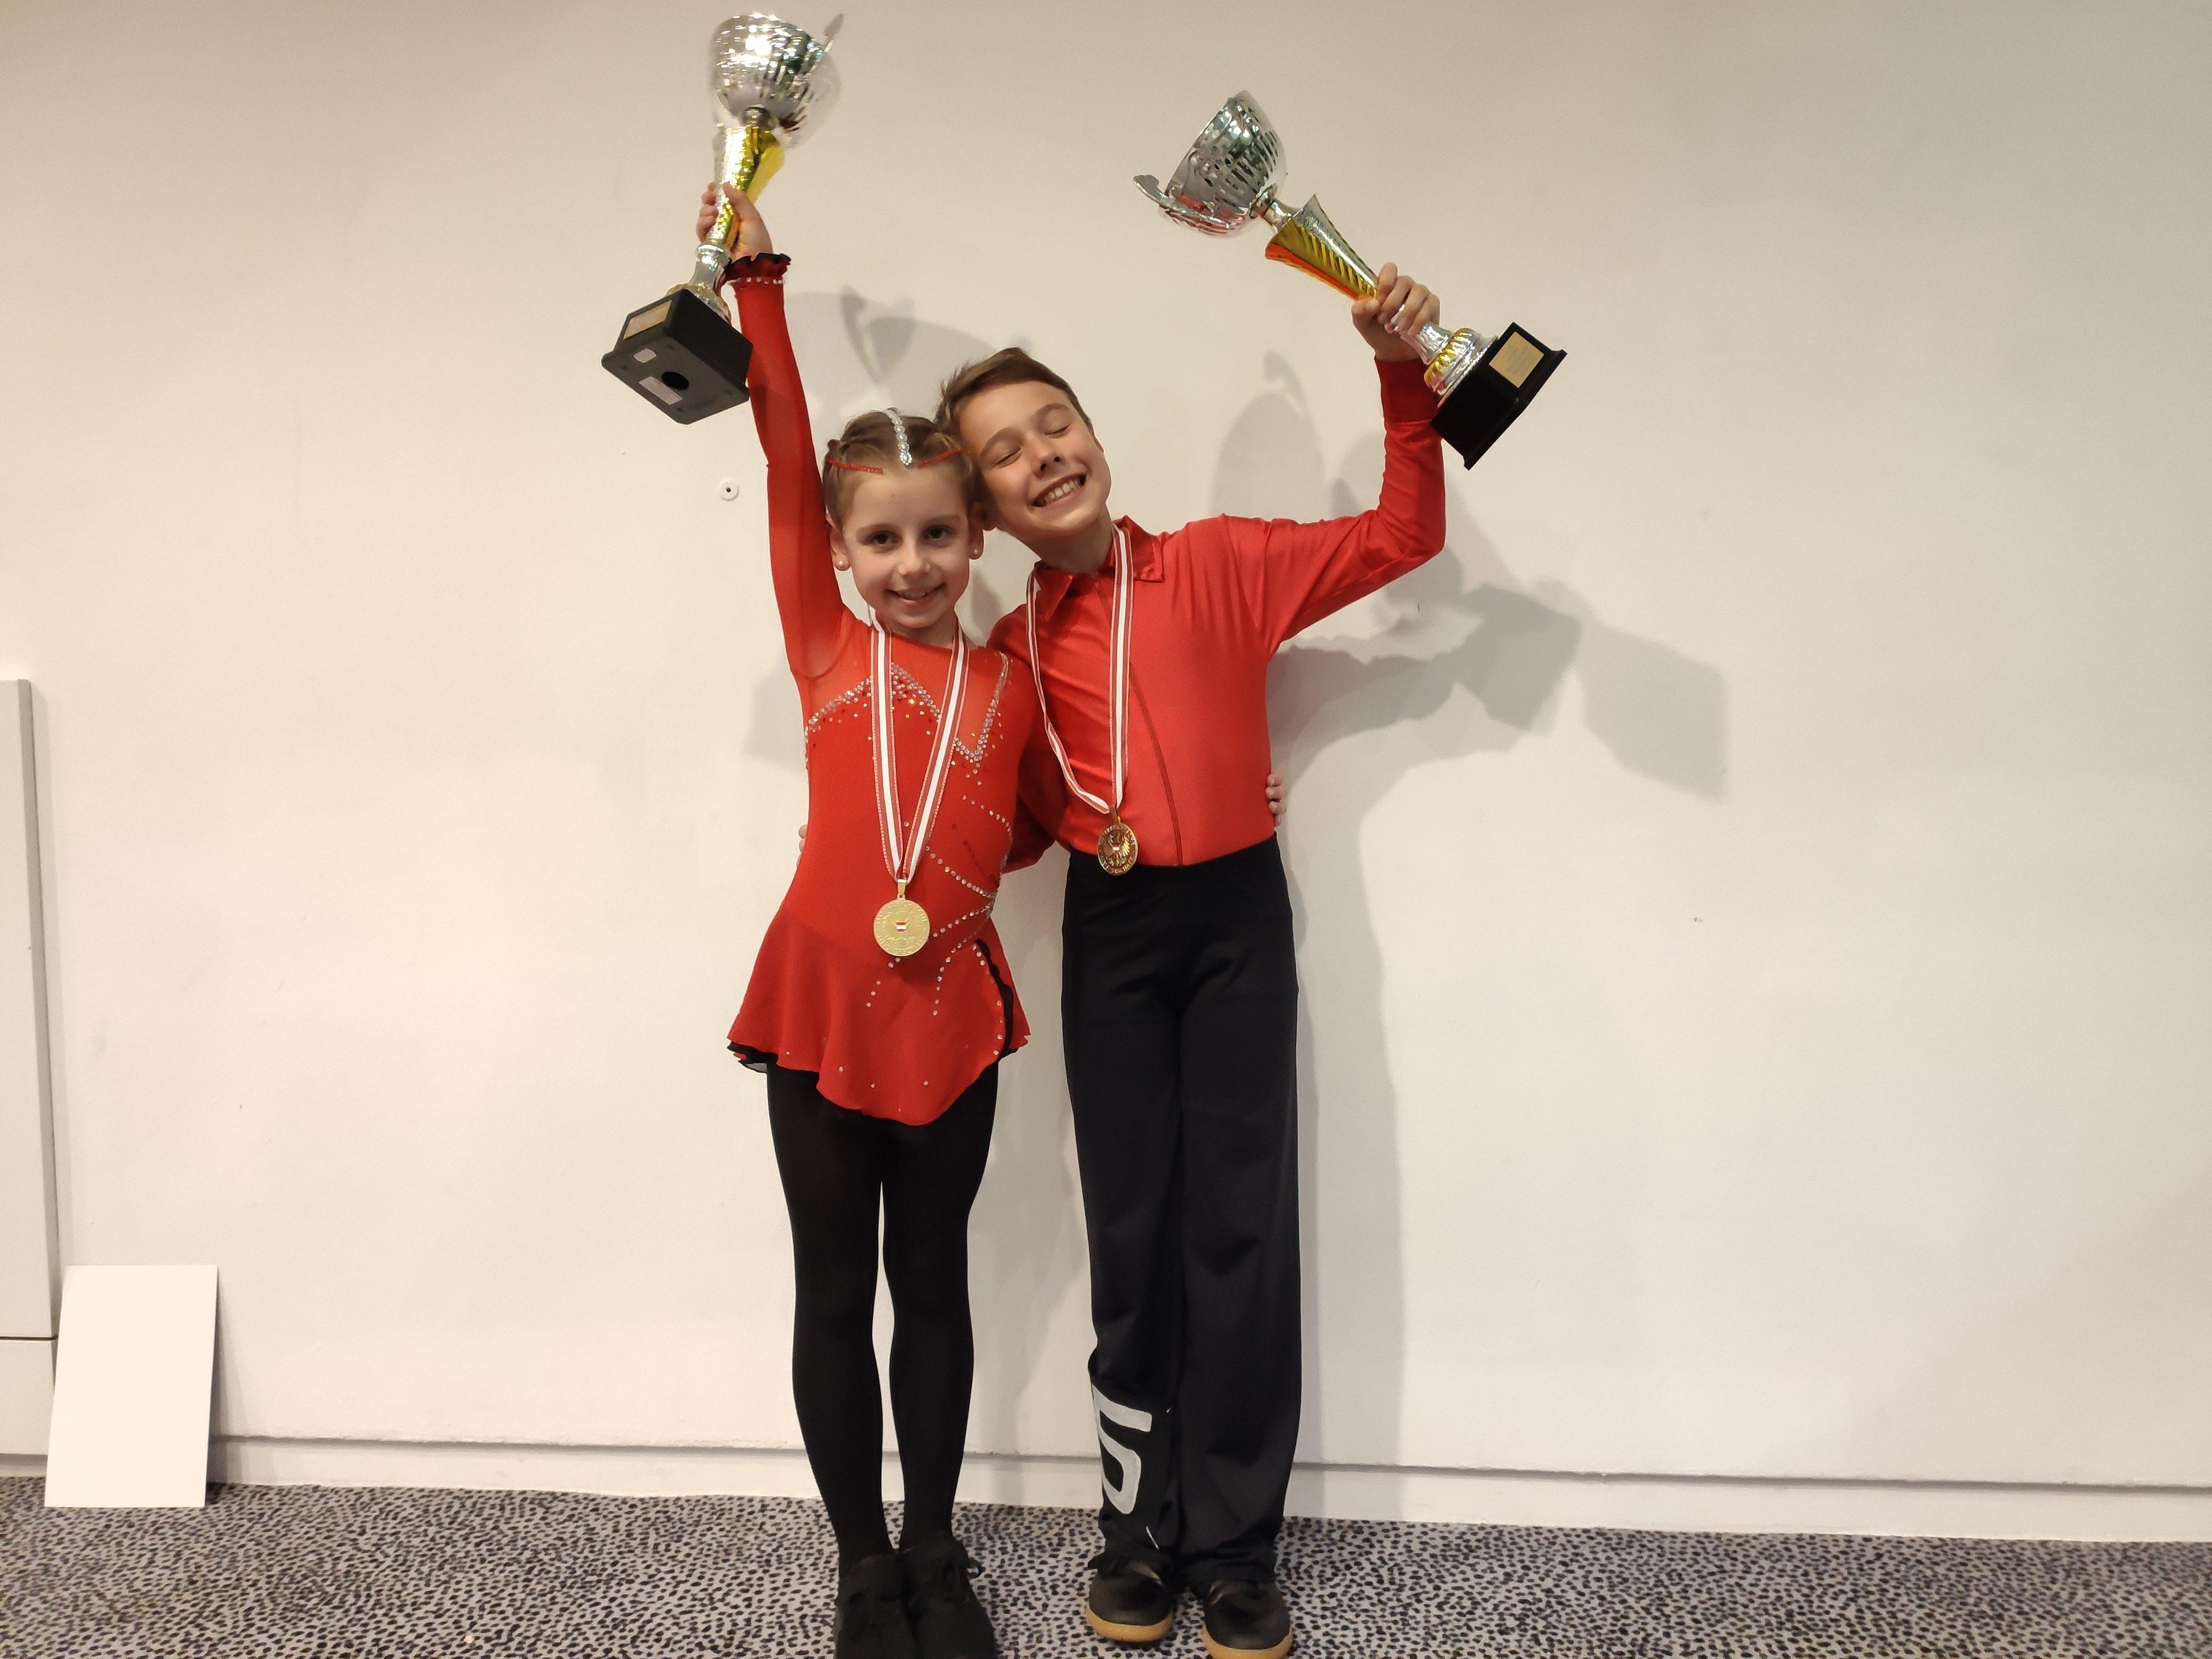 Sarah und Oskar - 1. Platz